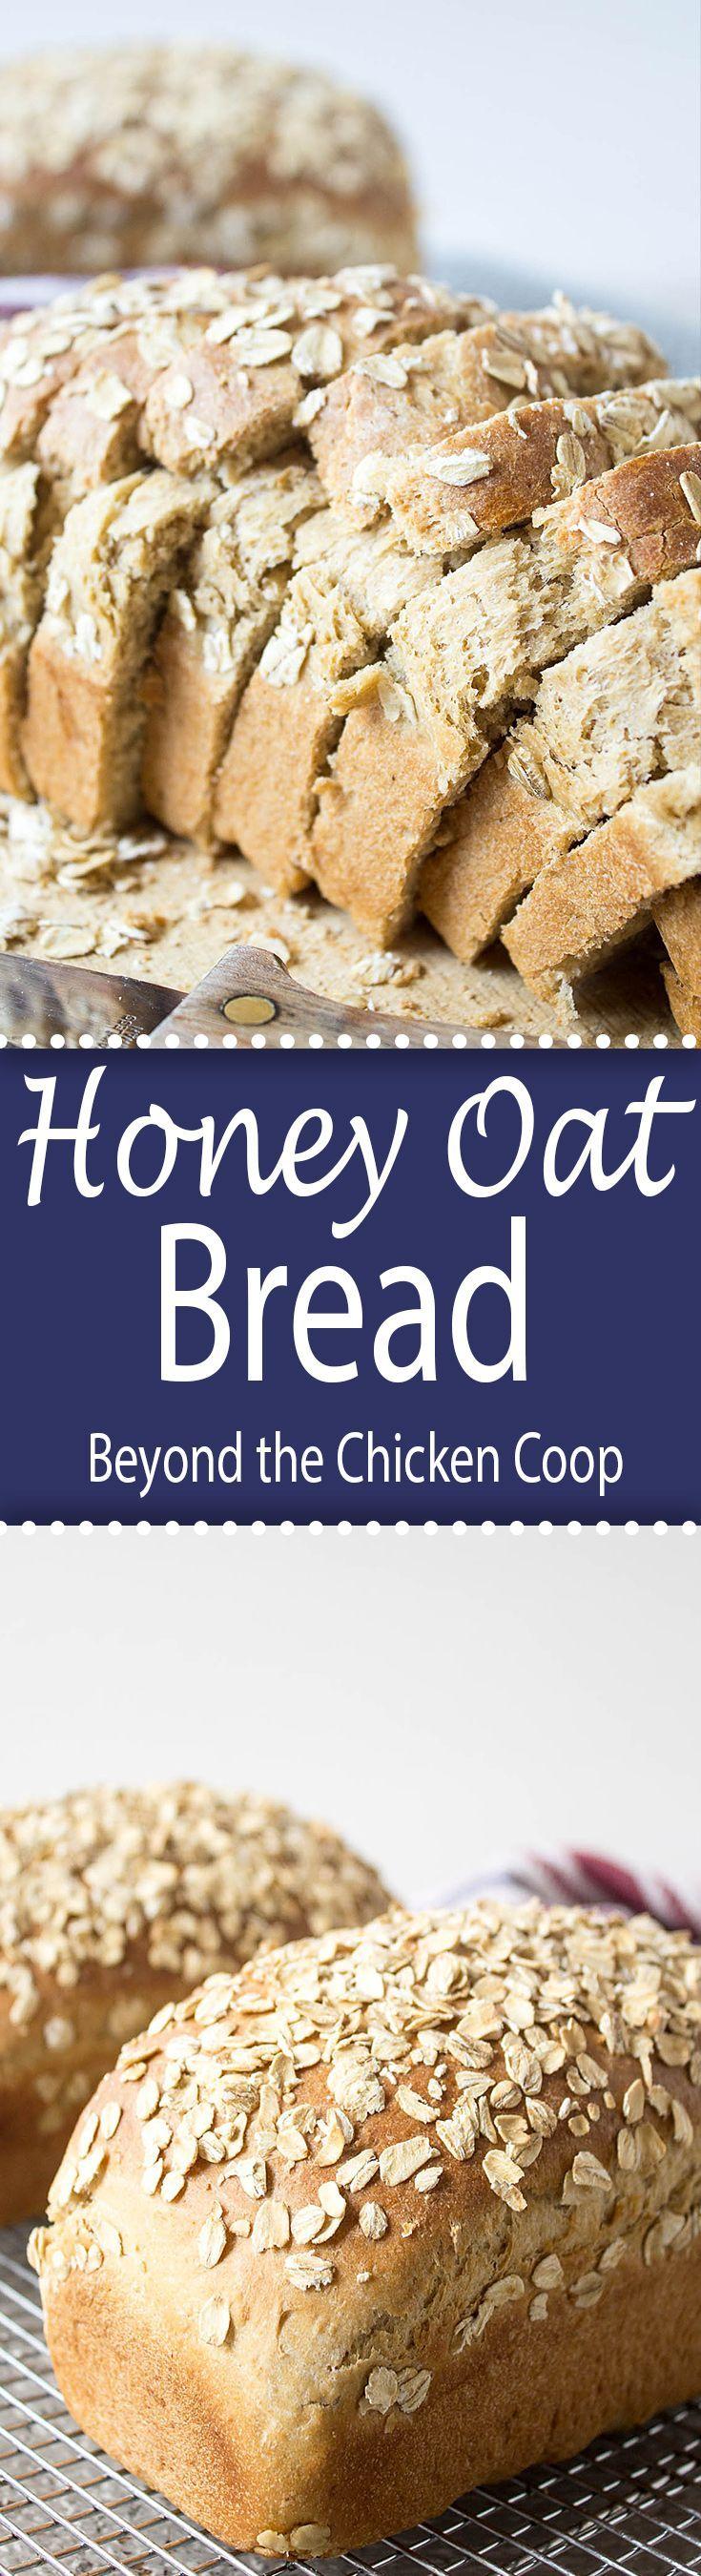 Delicious homemade honey oat bread!